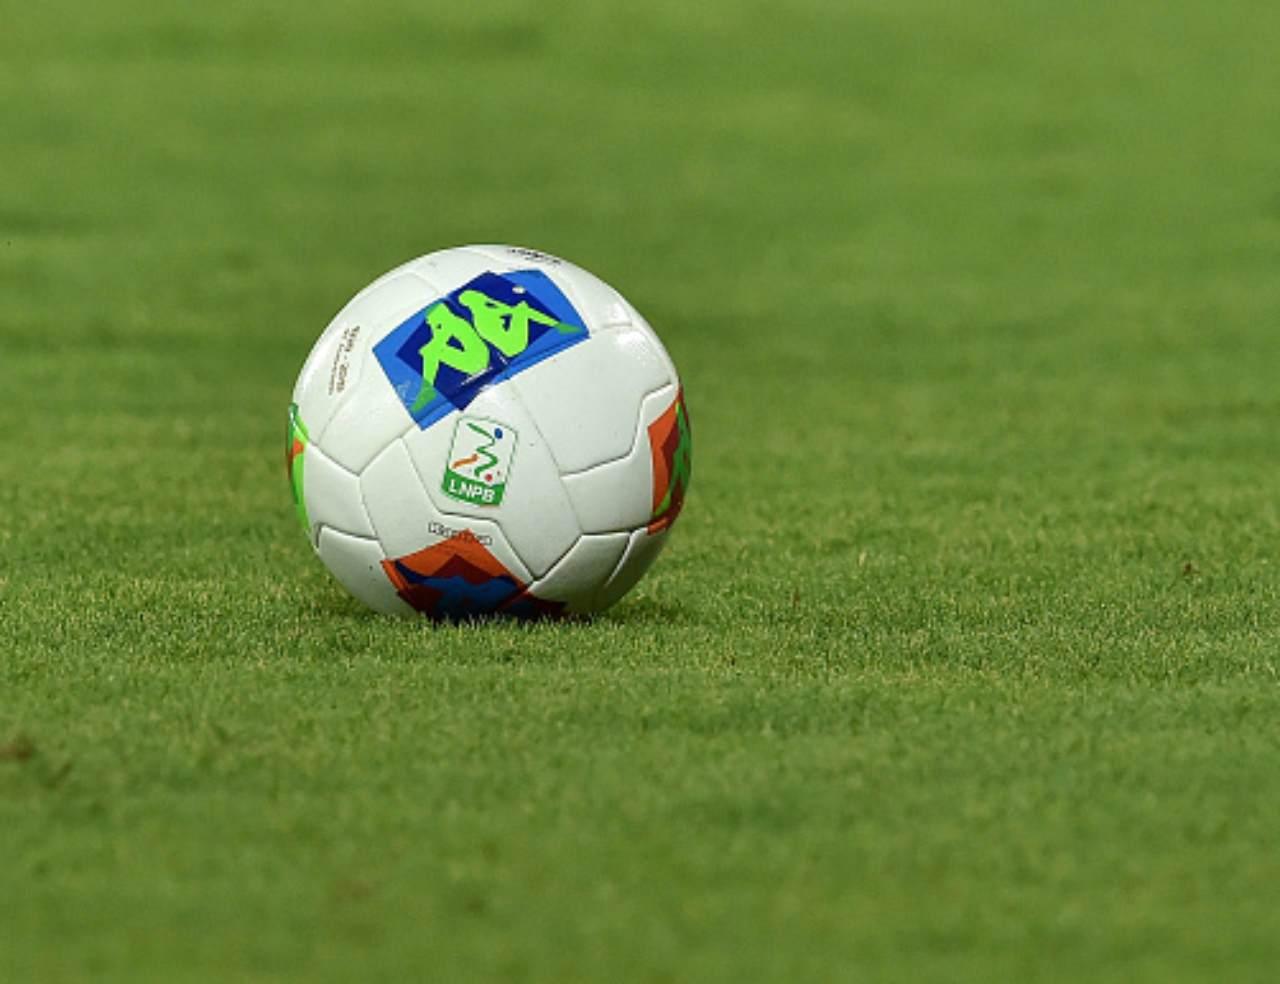 Serie B programma 8a 10a giornata